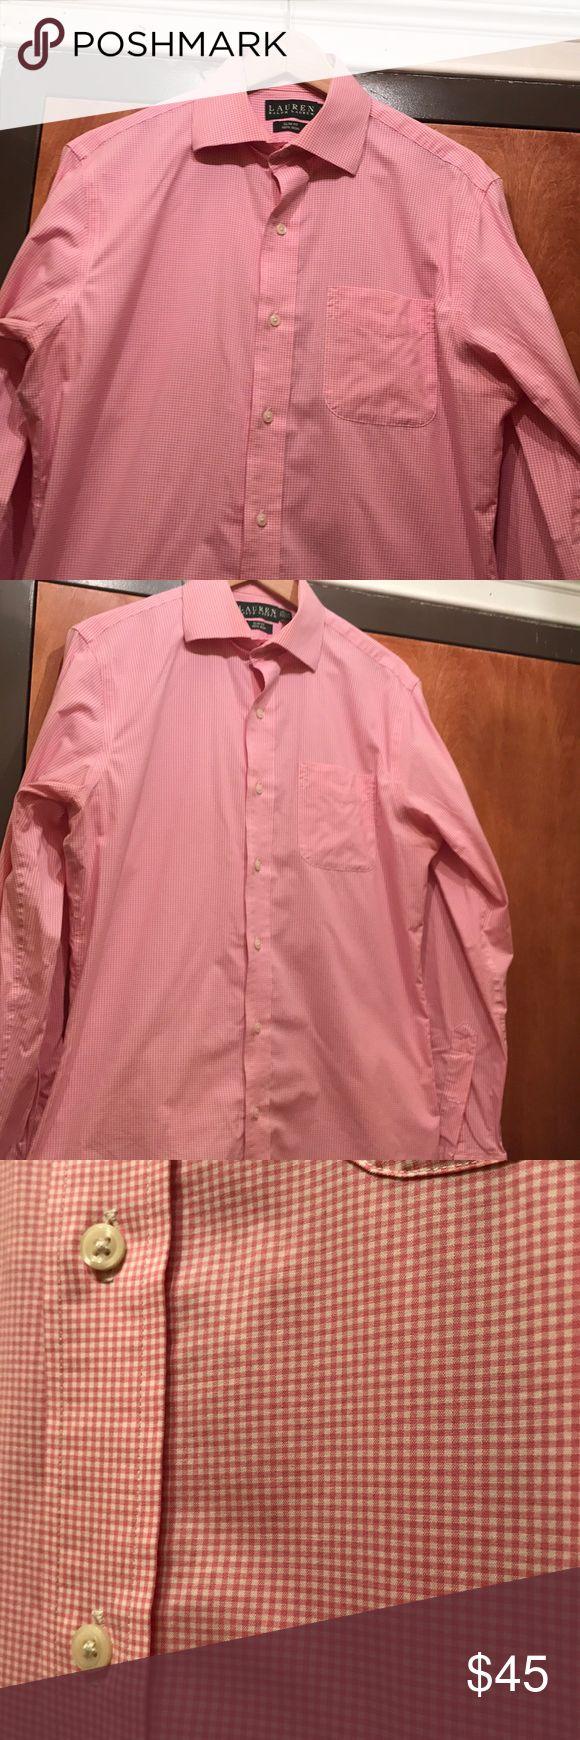 Men's Ralph Lauren Slim fit 15 1/2, 34-35 Pink checkered  Non iron Slim fit LAUREN Ralph Lauren 15 1/2, 34-35 Space under the collar for collar stays. Ralph Lauren Shirts